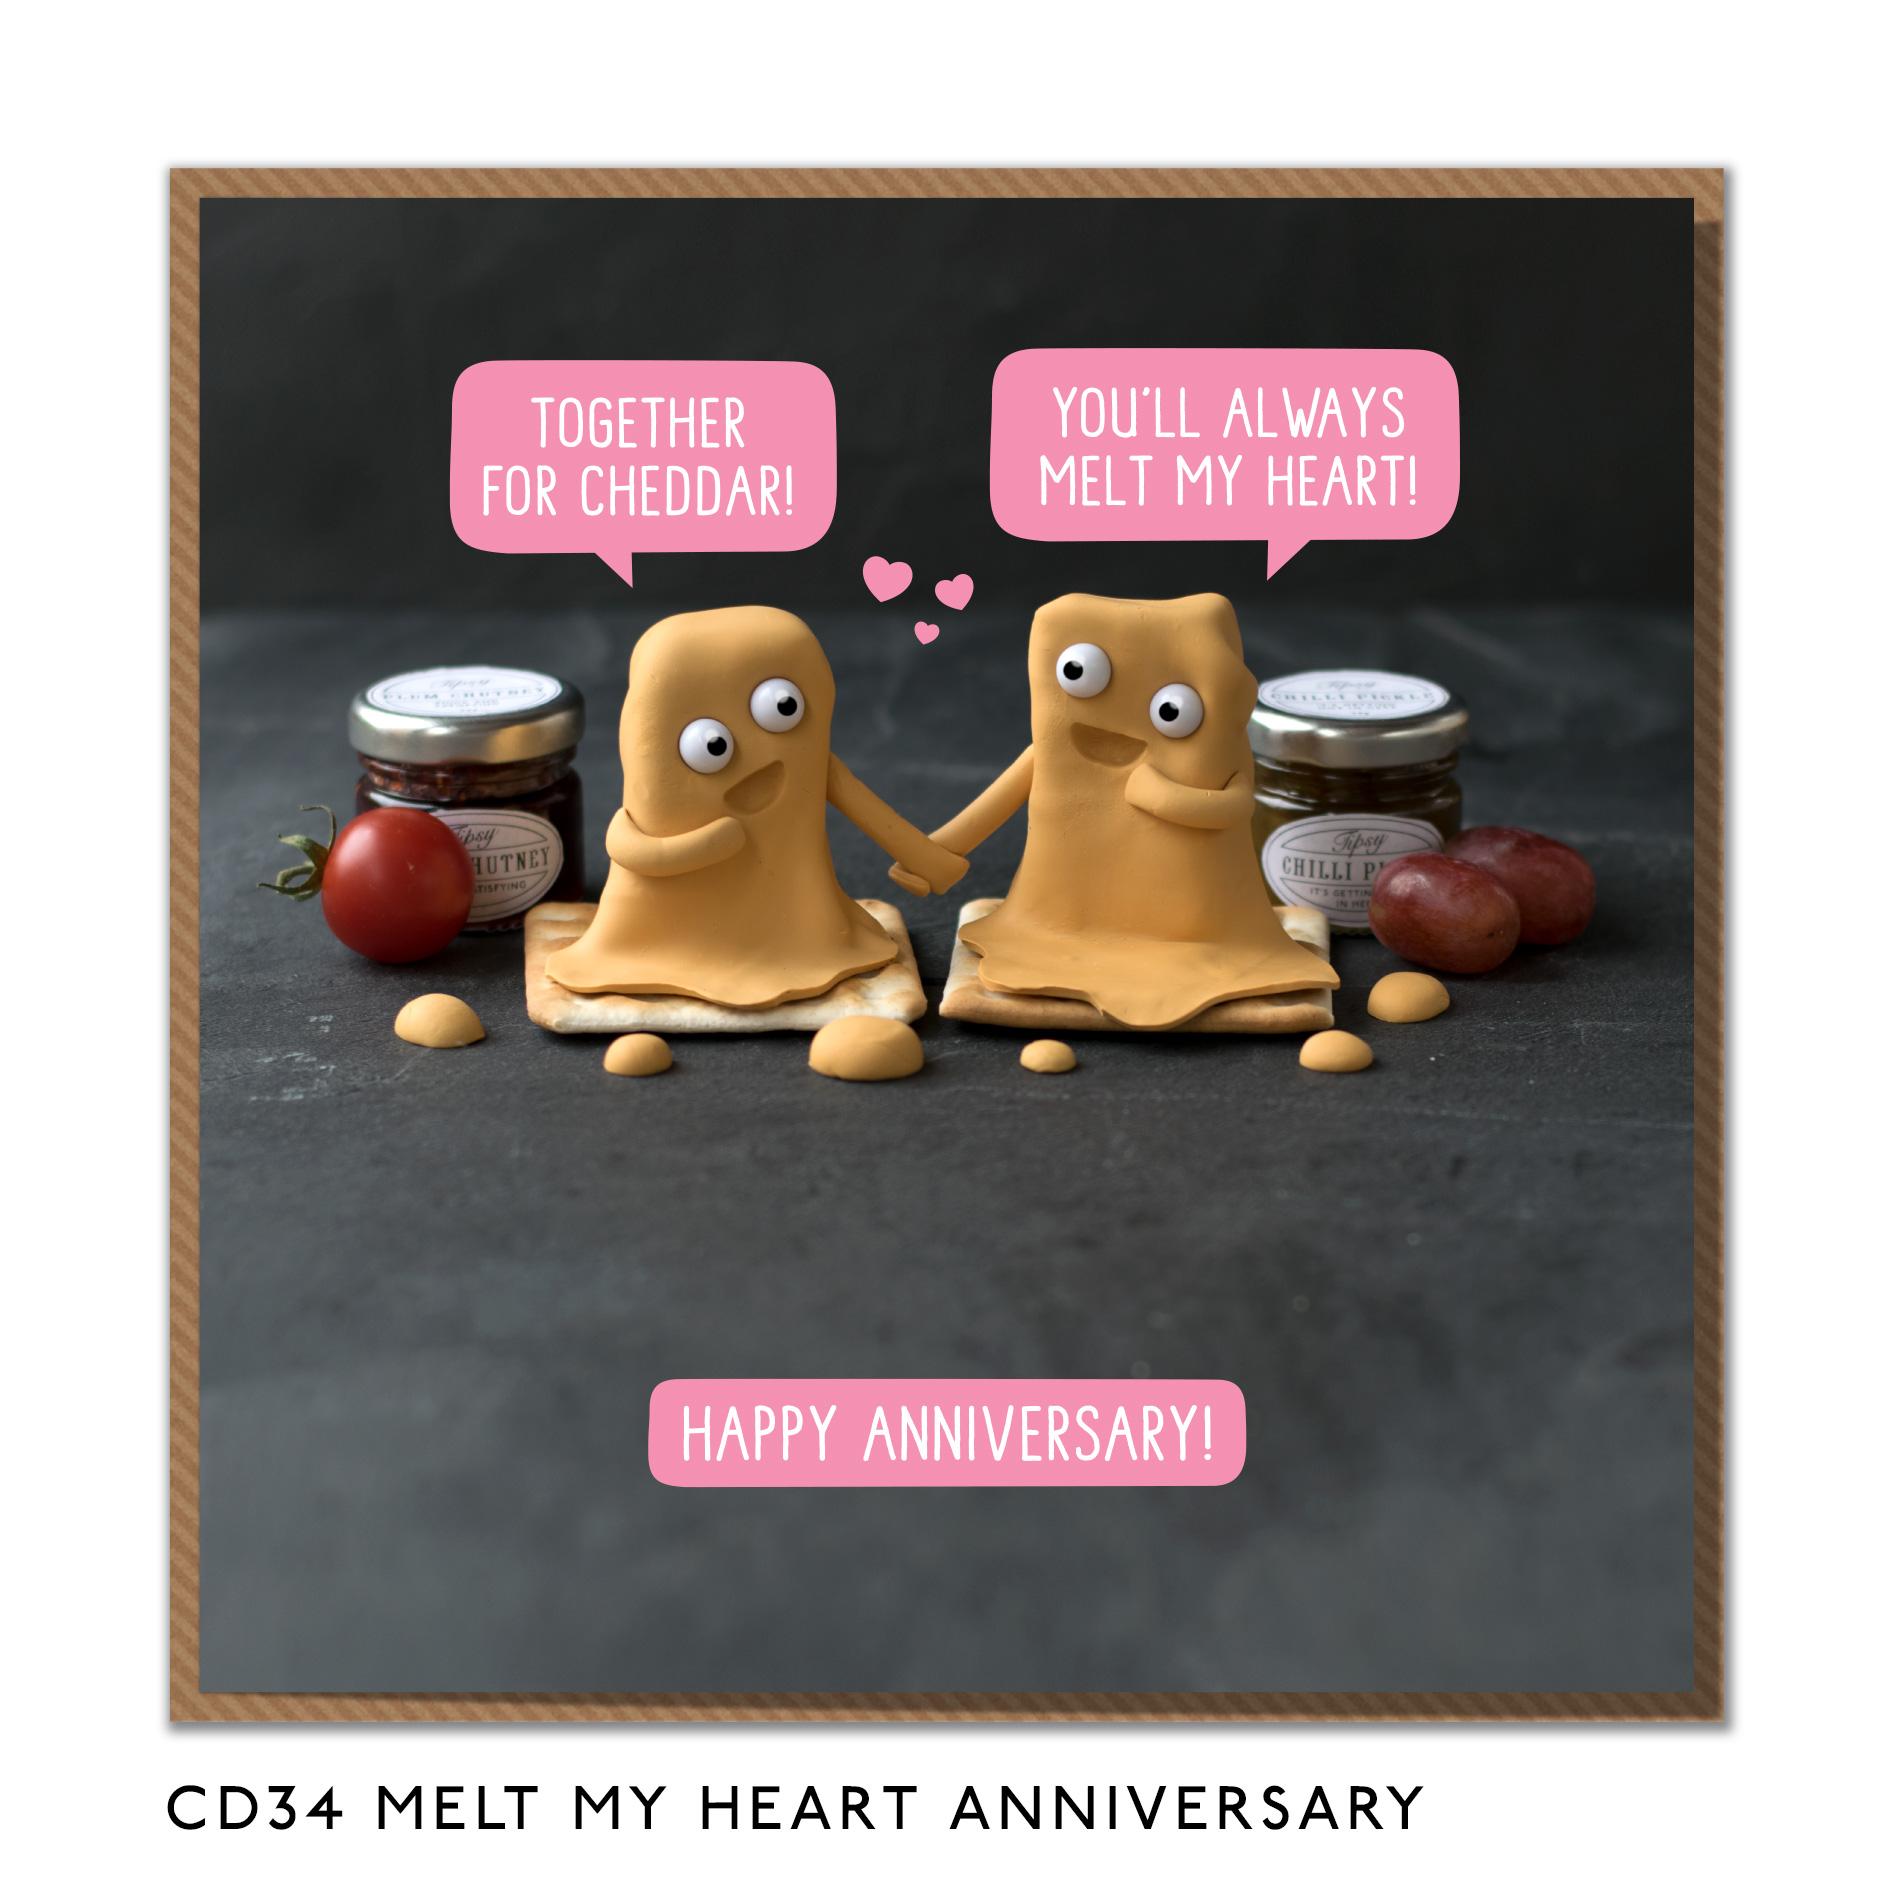 CD34-MELT-MY-HEART-ANNIVERSARY.jpg